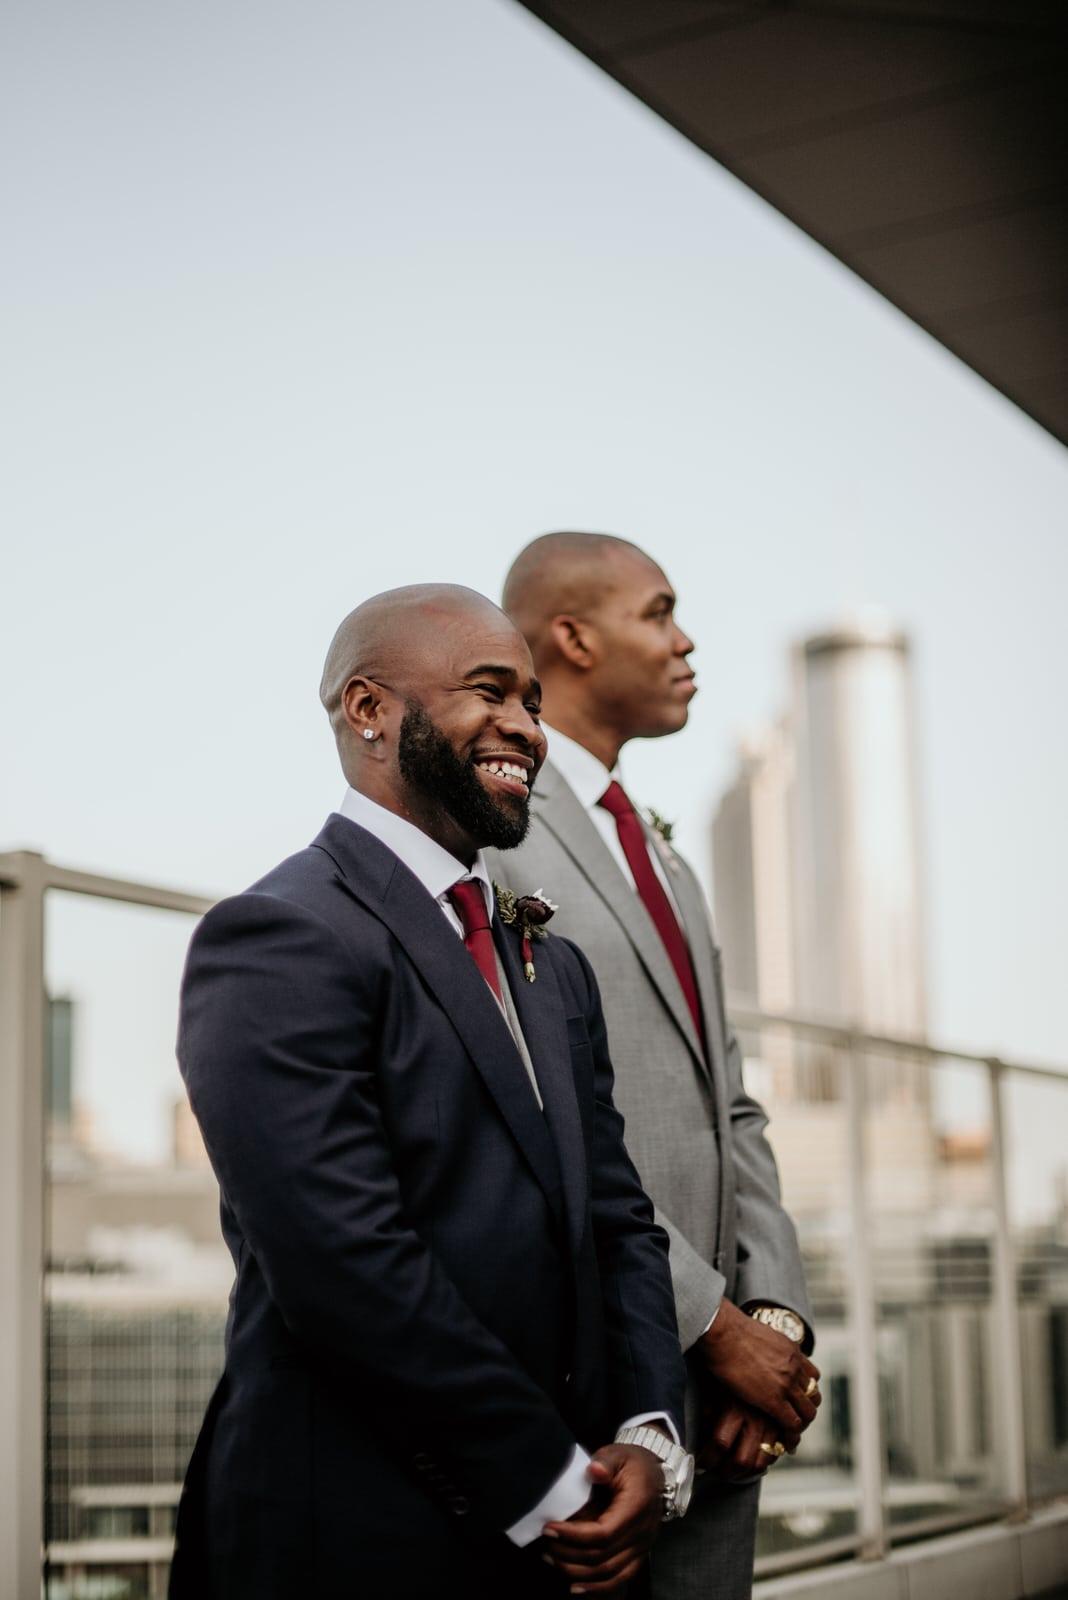 Groom smiling as he awaits his bride